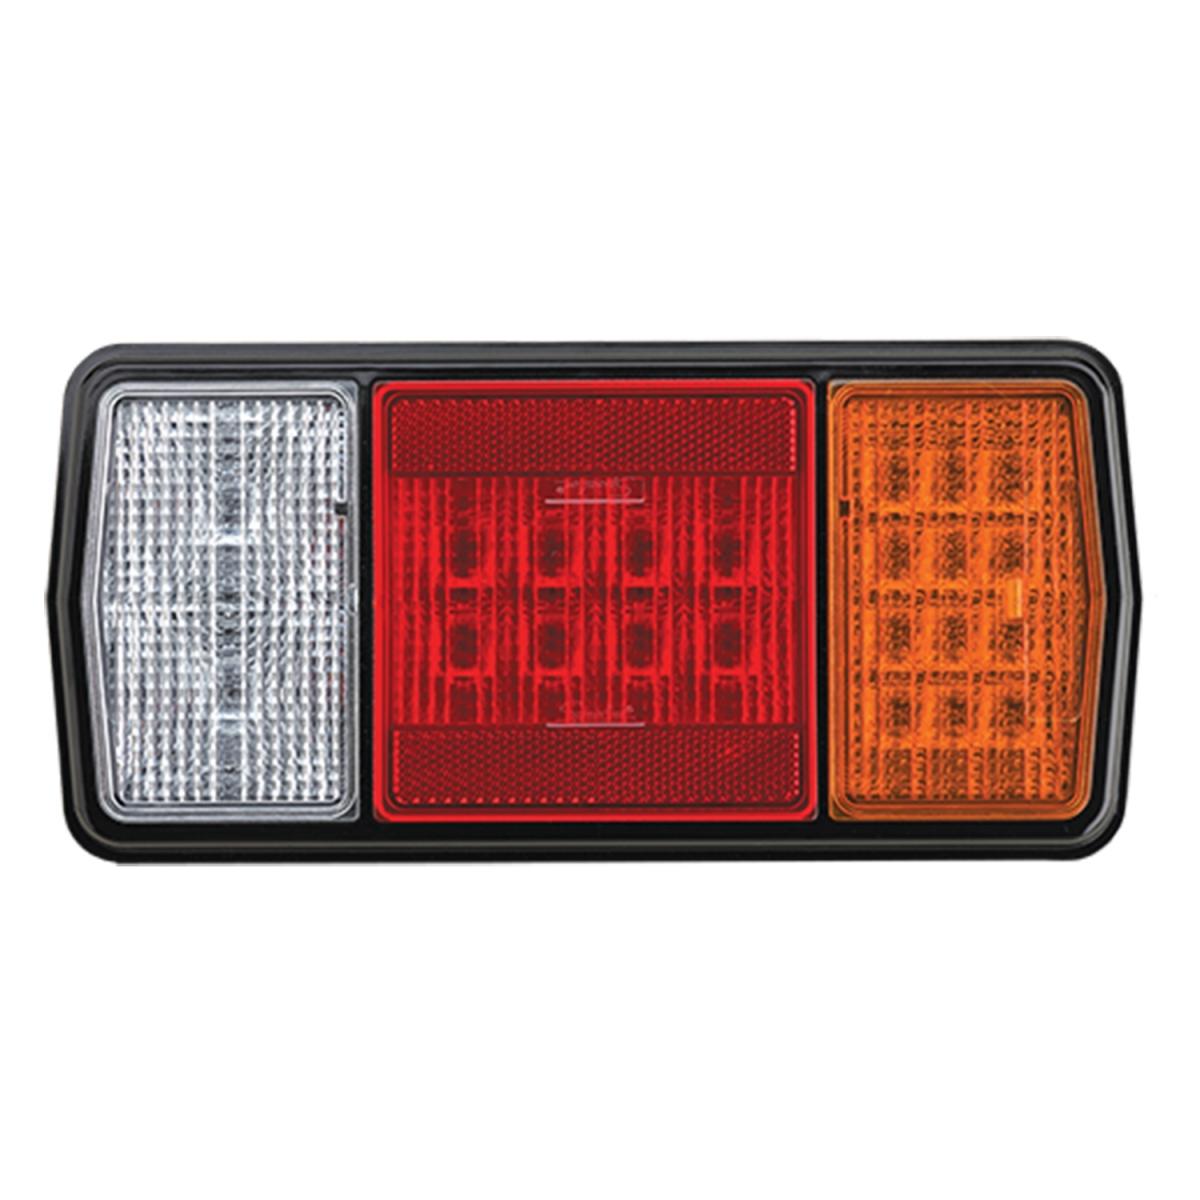 LED Stop, Tail, Turn & Backup Light – Model 265